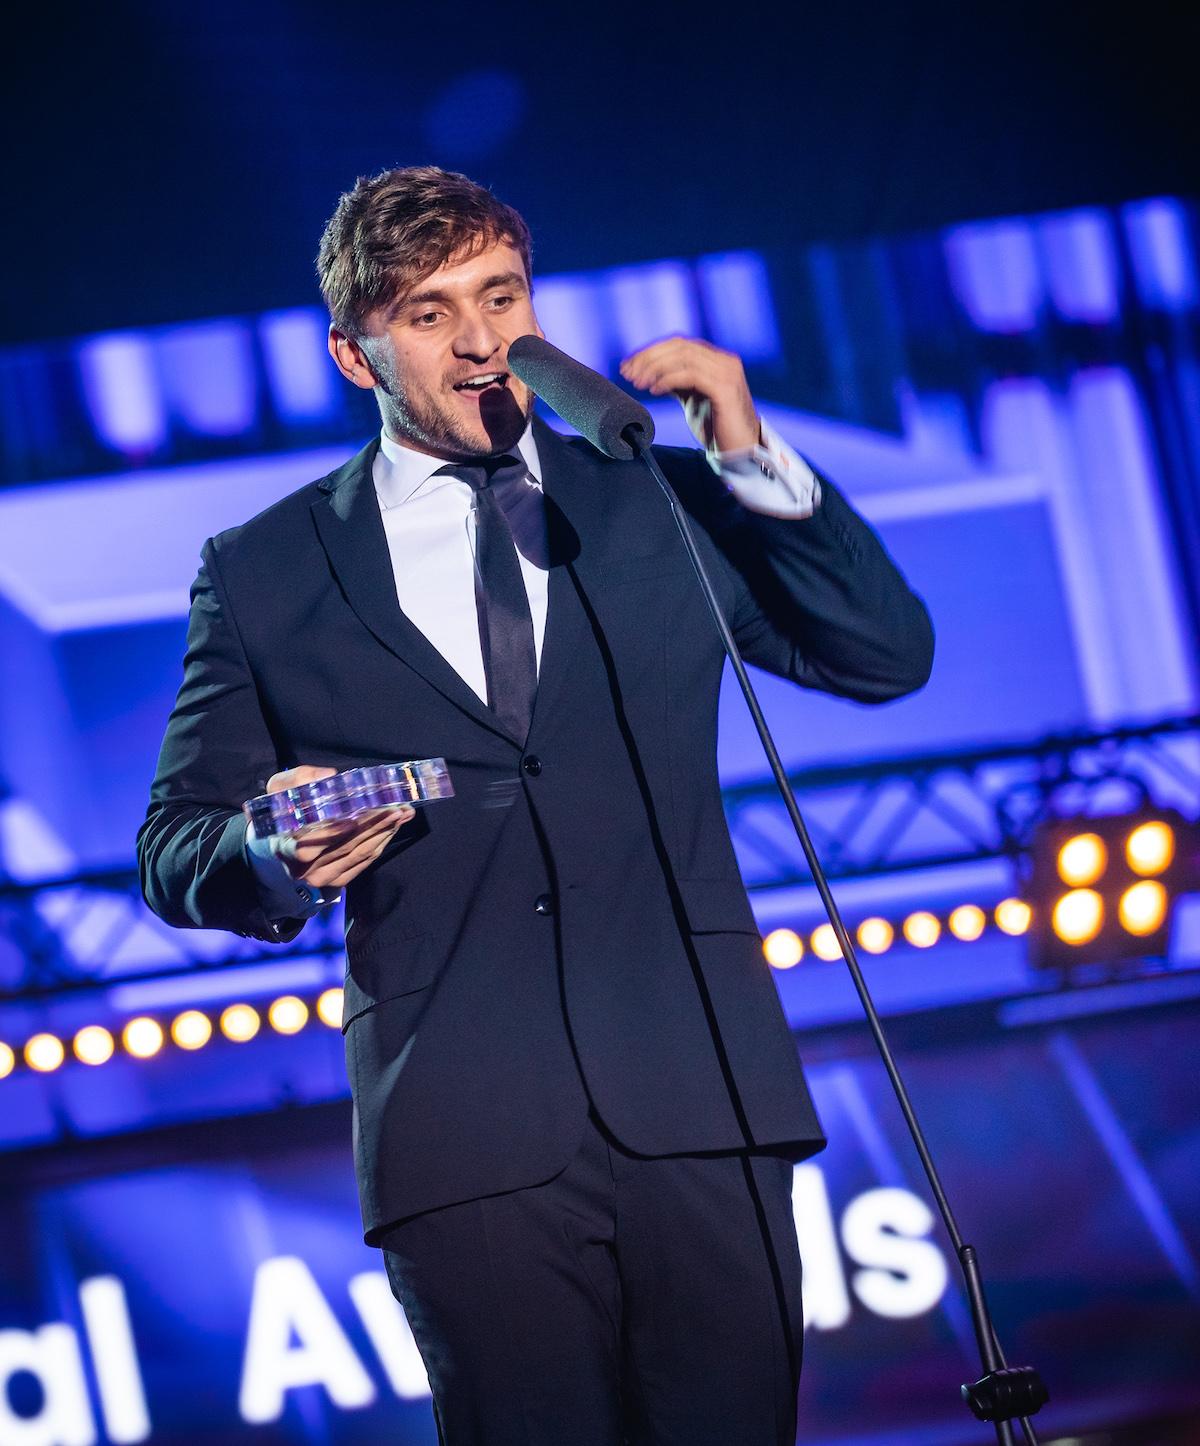 Kategorii Fun & Entertainment vyhrál Tary alias Taras Povoroznyk